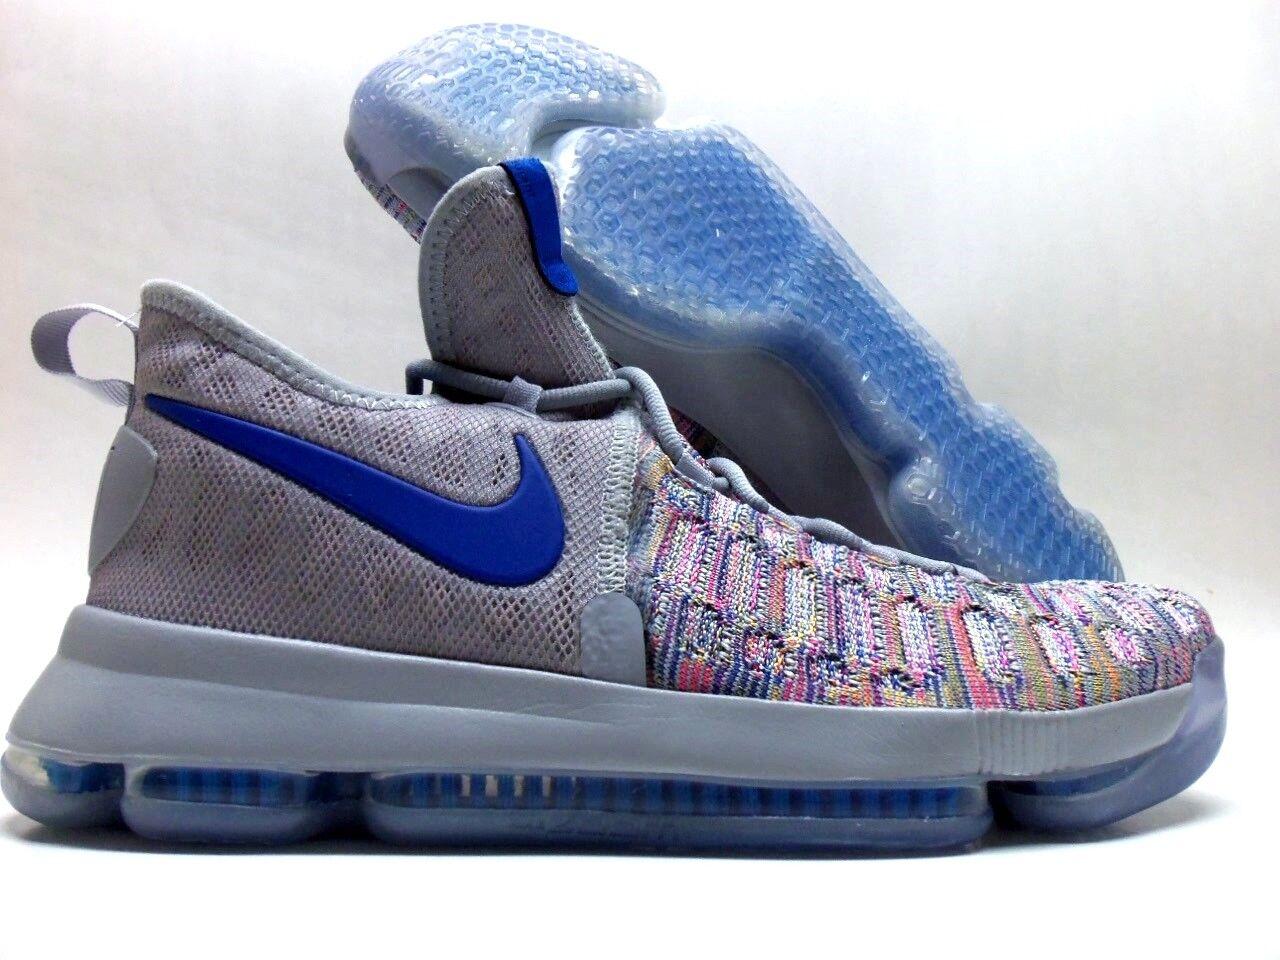 Nike kd 9 ix id kevin durant multi-color / cool grey-royal sz uomini [863695-984]